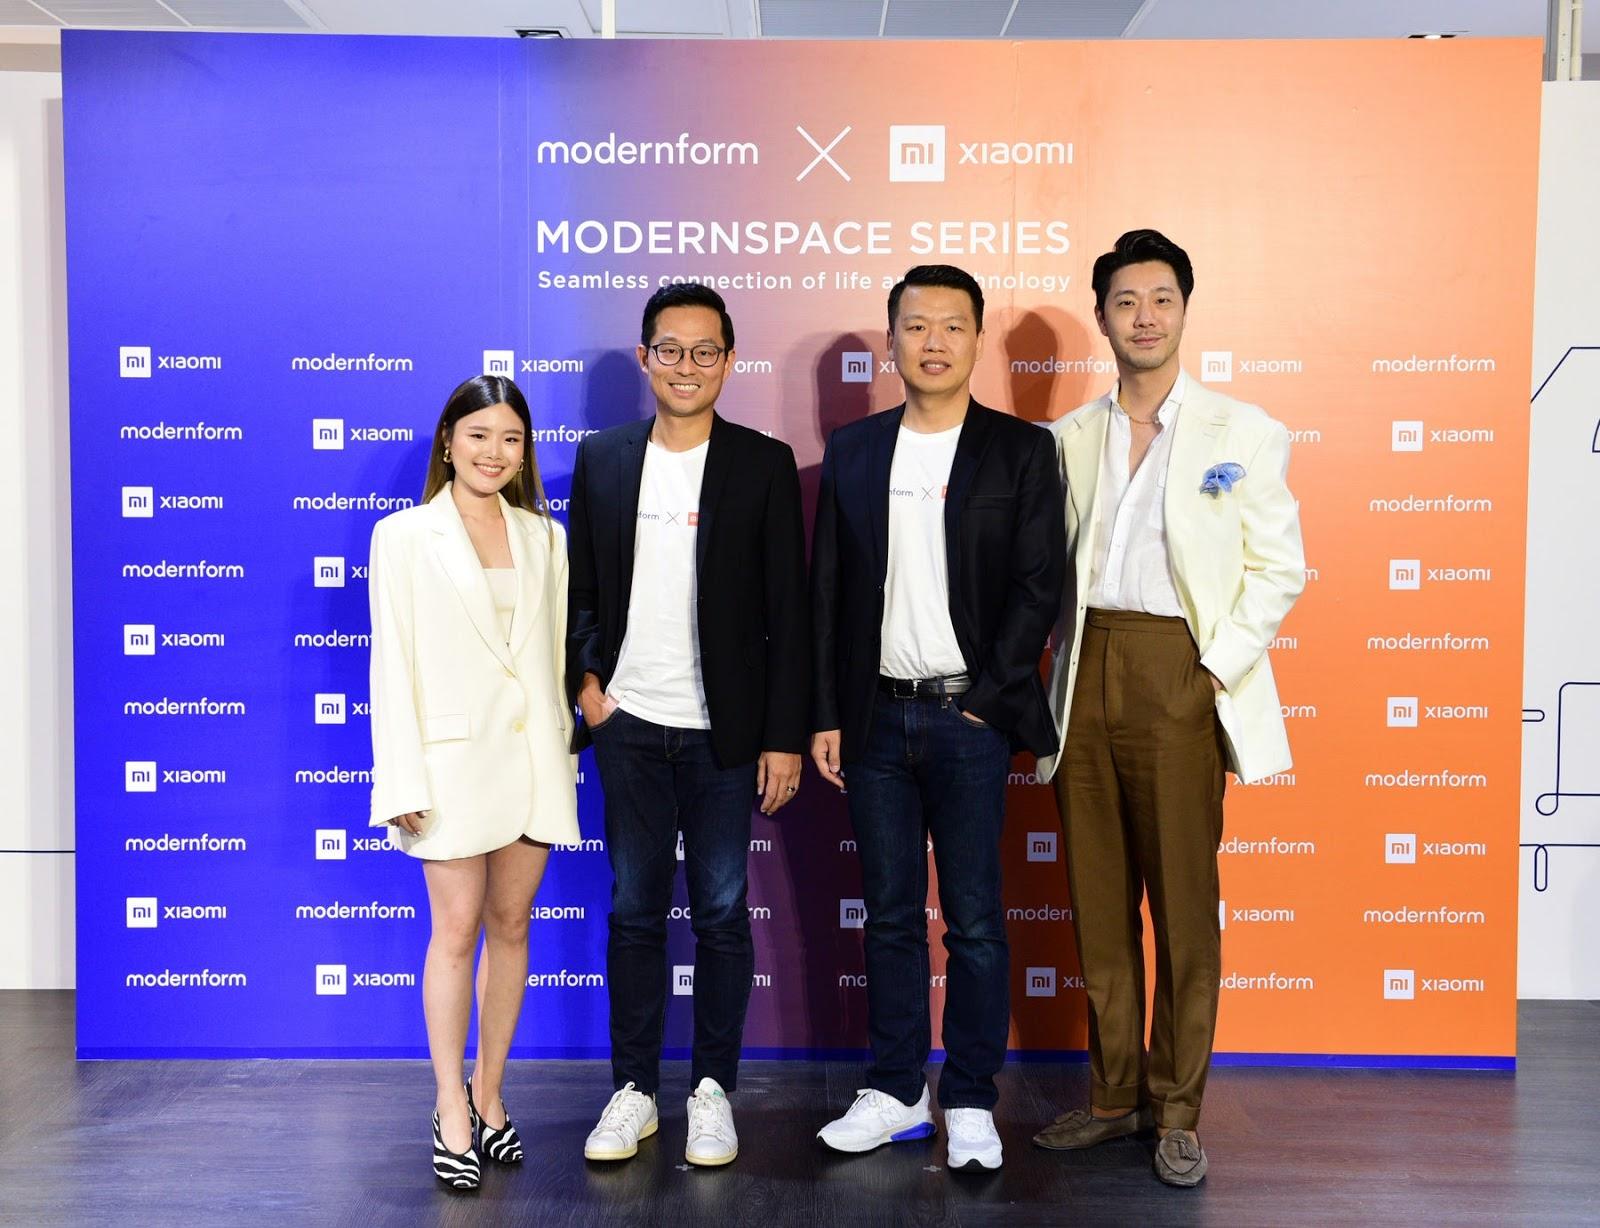 "Modernform x Xiaomi สร้างปรากฏการณ์นวัตกรรมการออกแบบเฟอร์นิเจอร์รูปแบบใหม่ ""Modernspace Series"" ตอบโจทย์ไลฟ์สไตล์นิว นอร์มอล ผสานการใช้ชีวิตและเทคโนโลยีให้เป็นหนึ่ง"